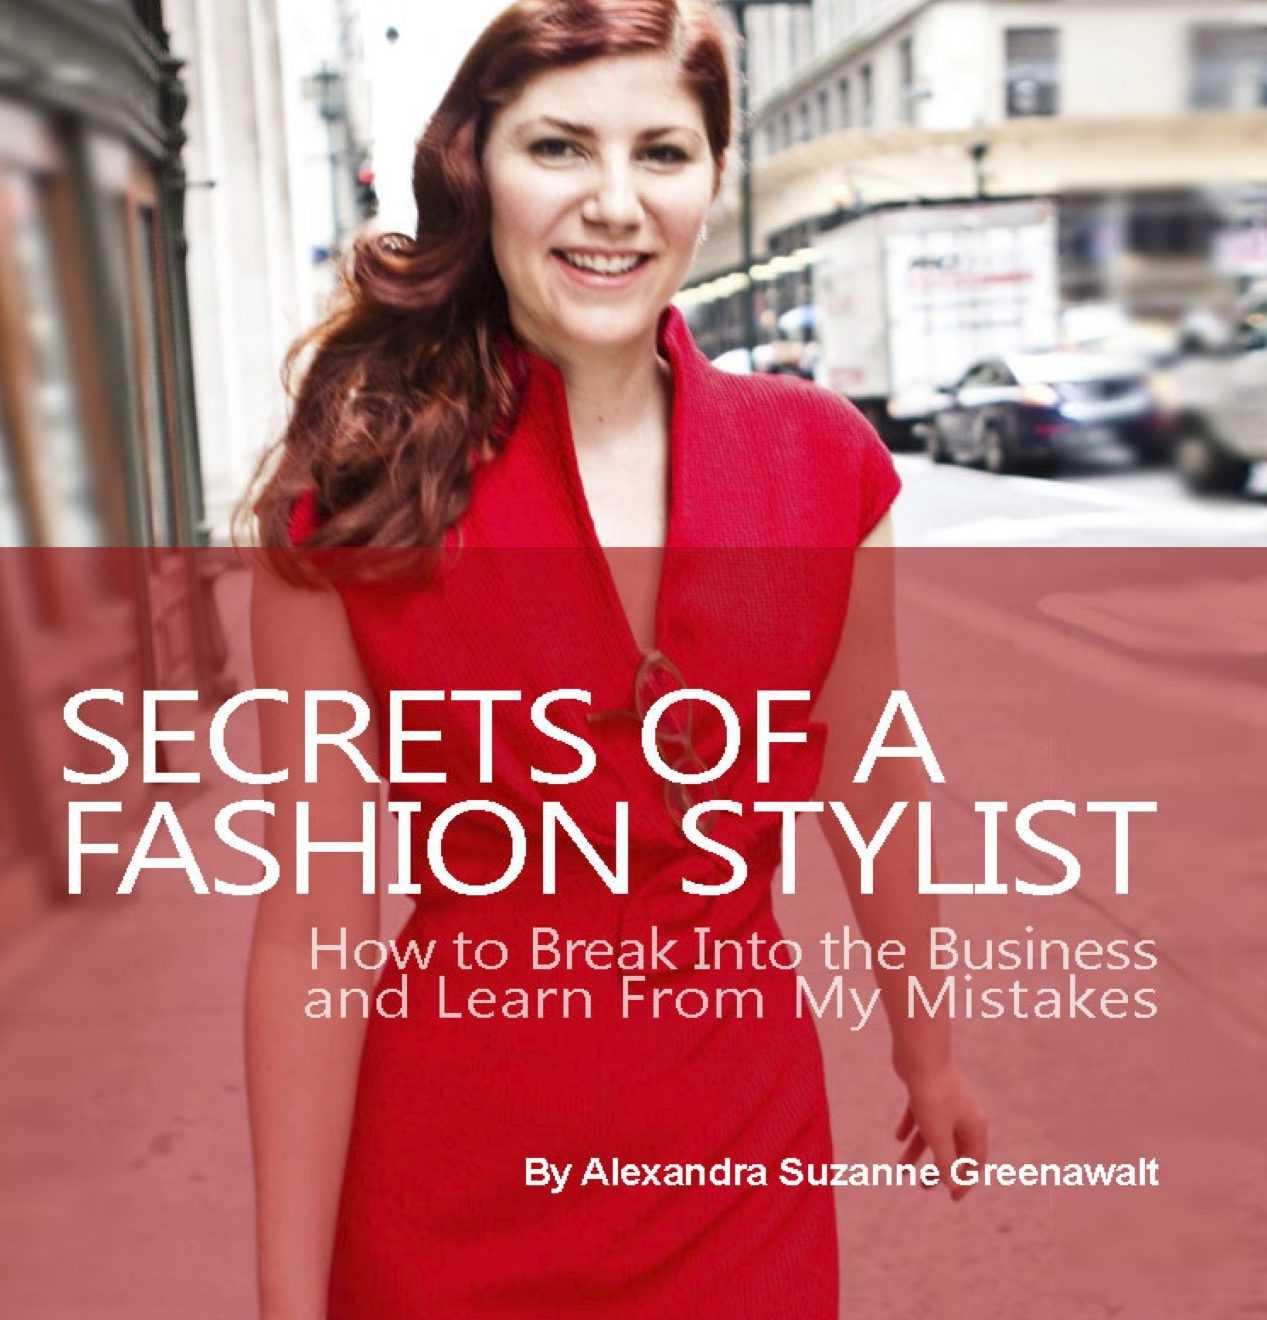 Secrets of a fashion stylist